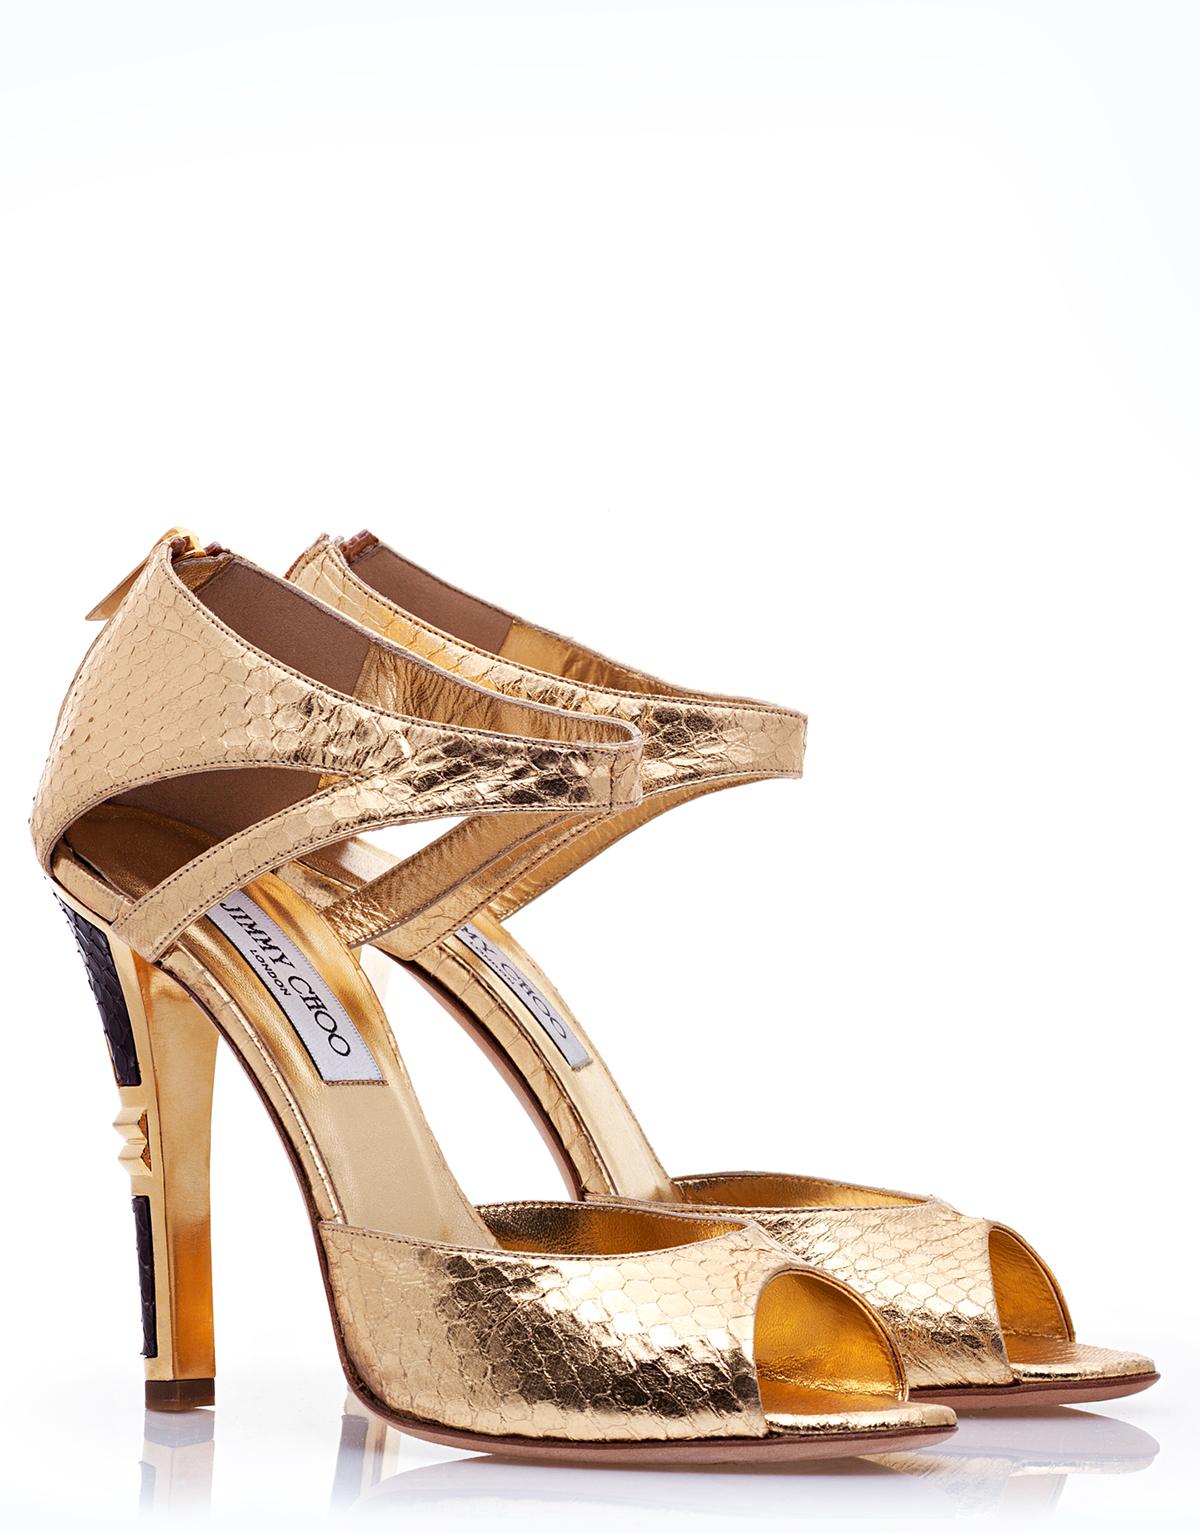 Босоножки золотого цвета без каблука